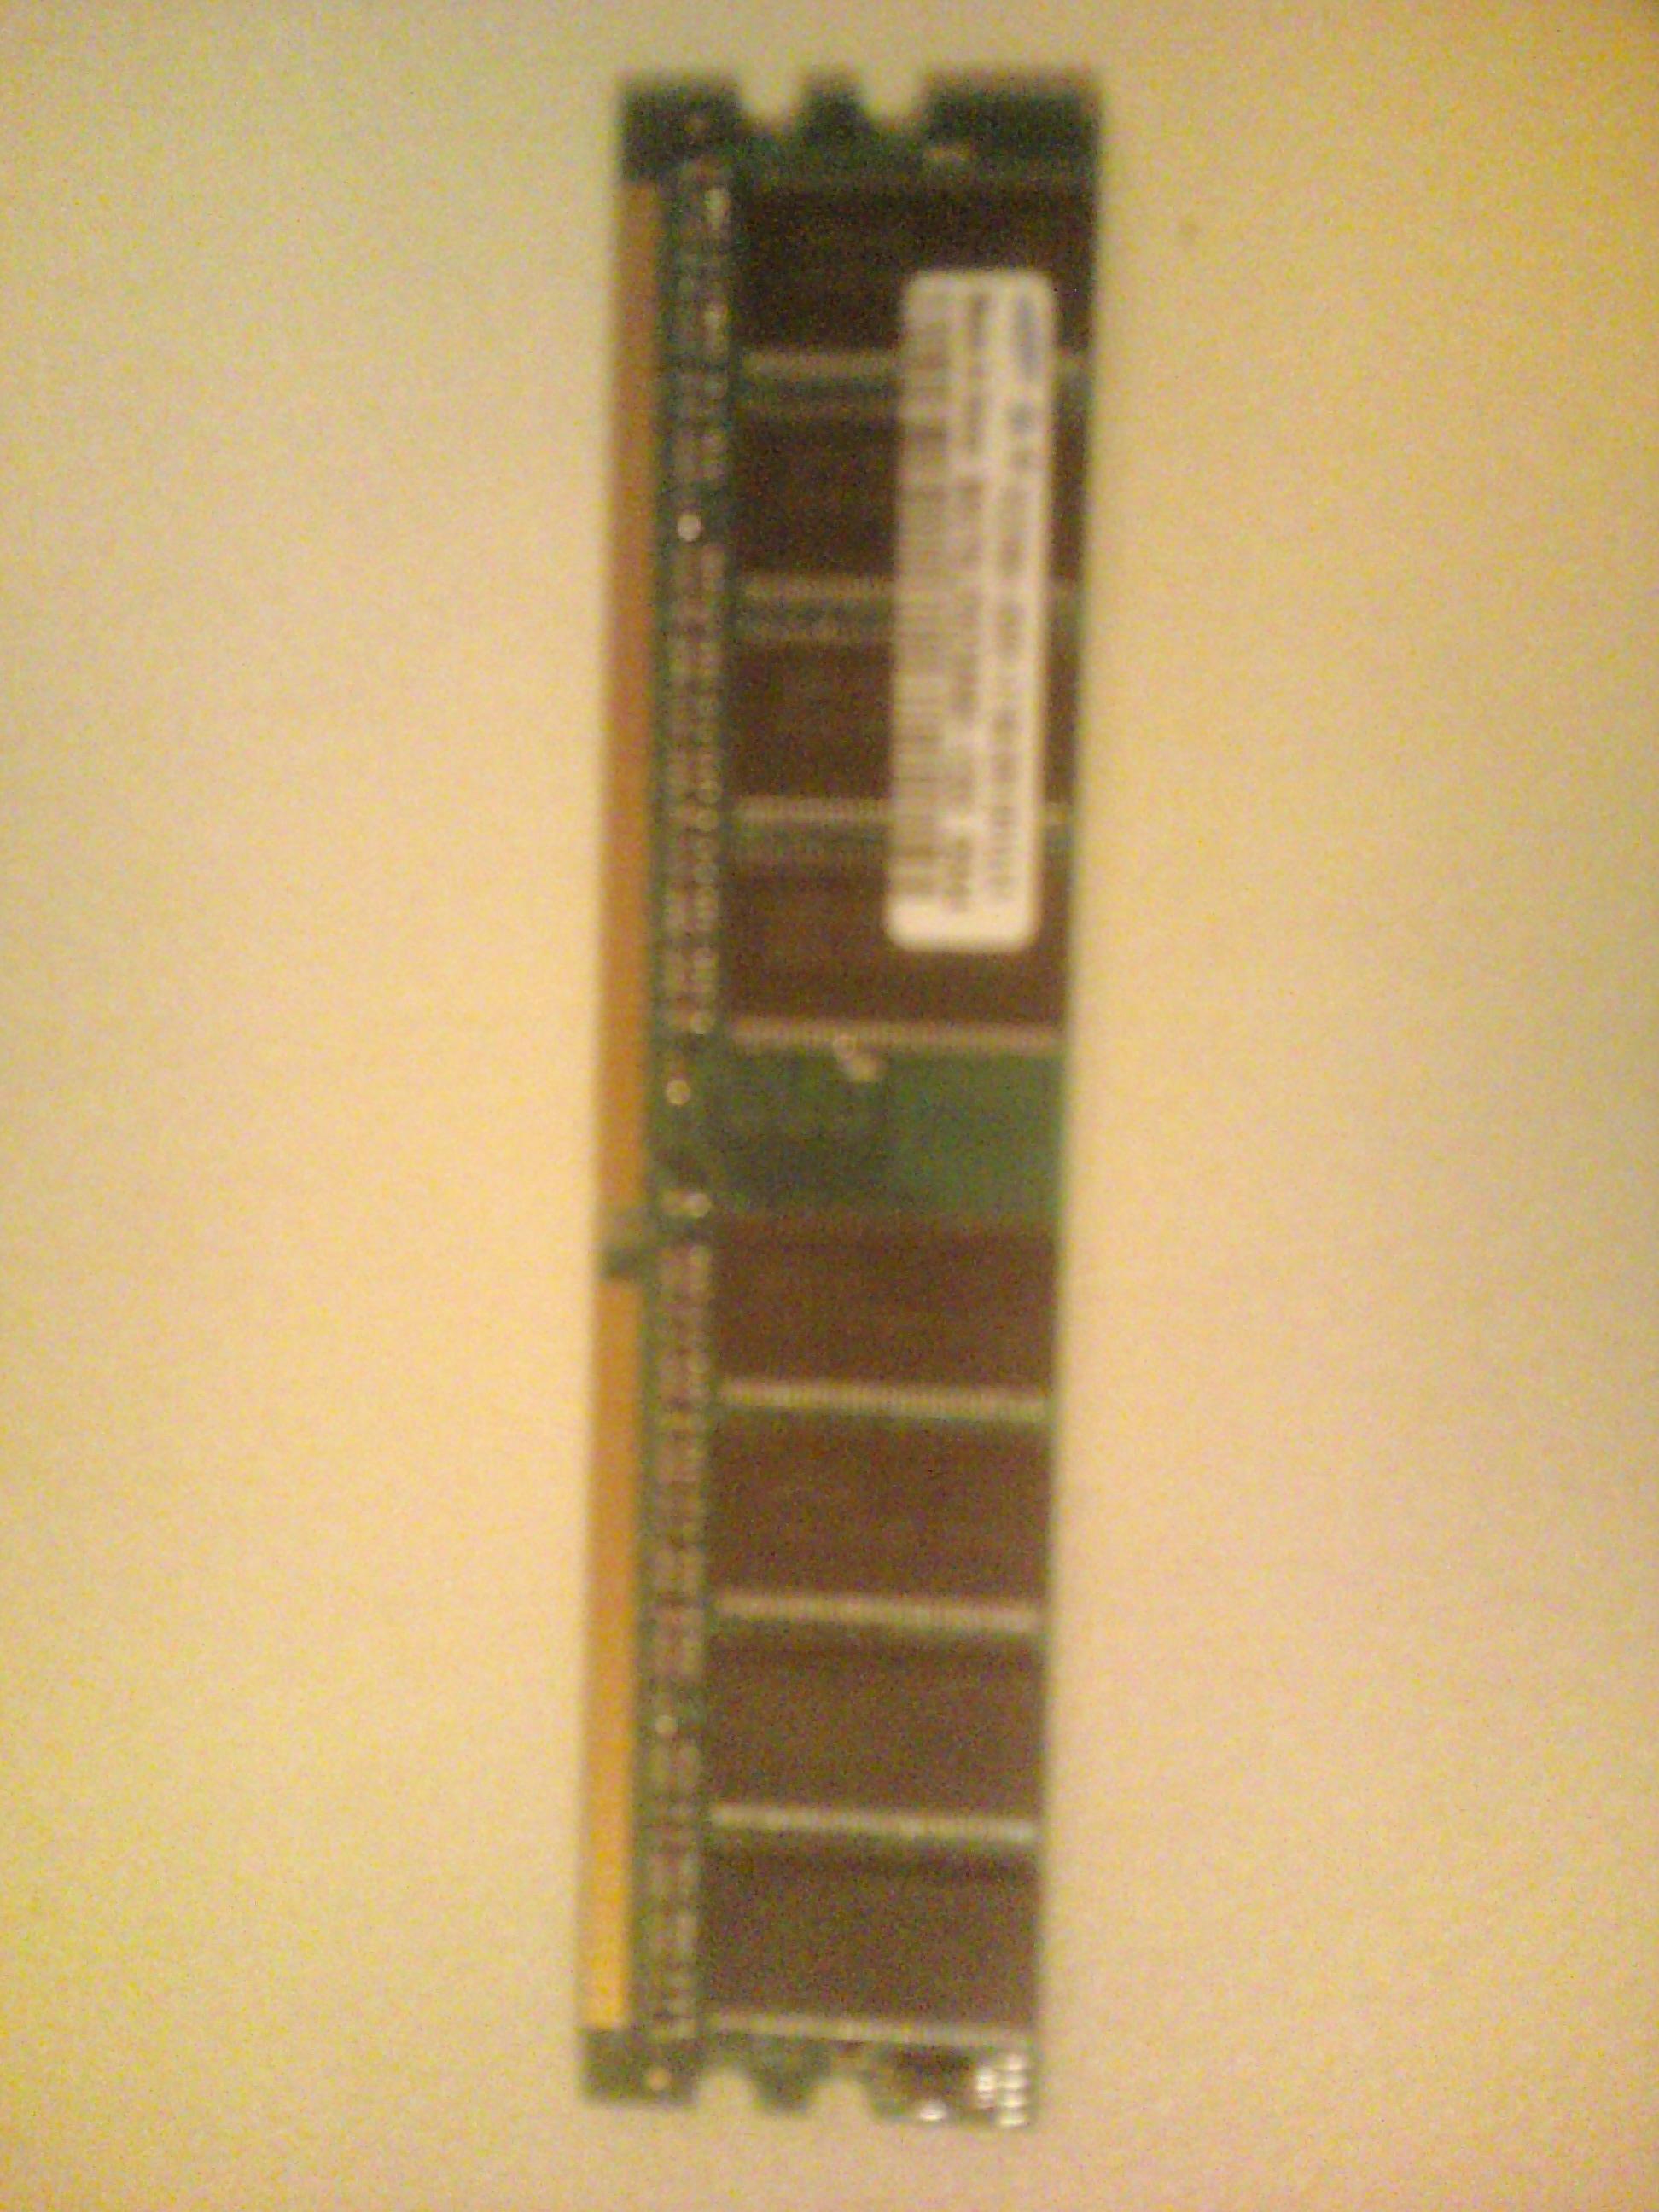 Gigabyte GA-8I915P-G - komputer nie startuje z now� pami�ci� RAM